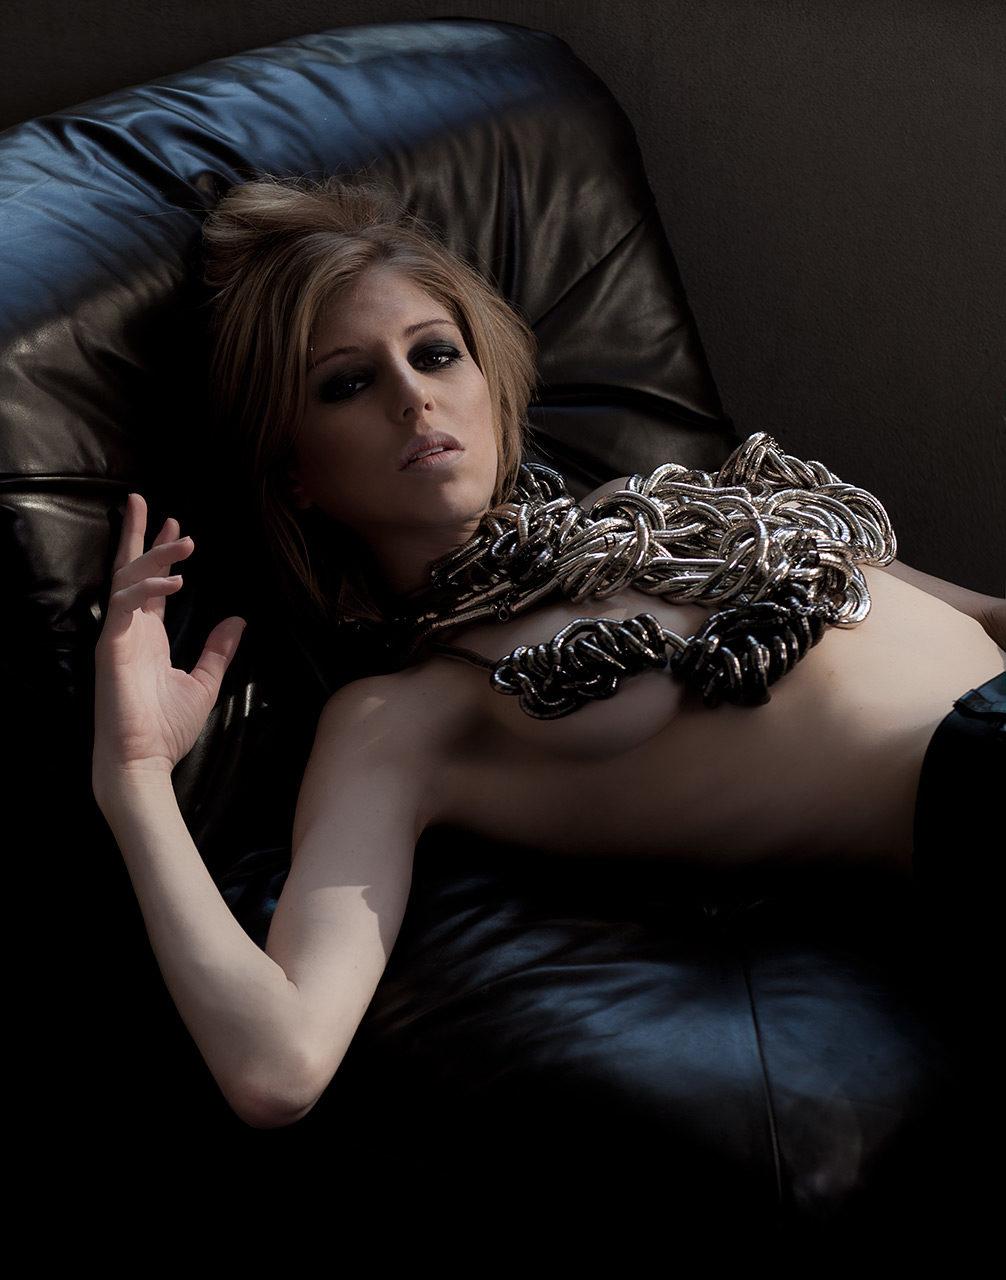 nude-model-sofa-jewelry